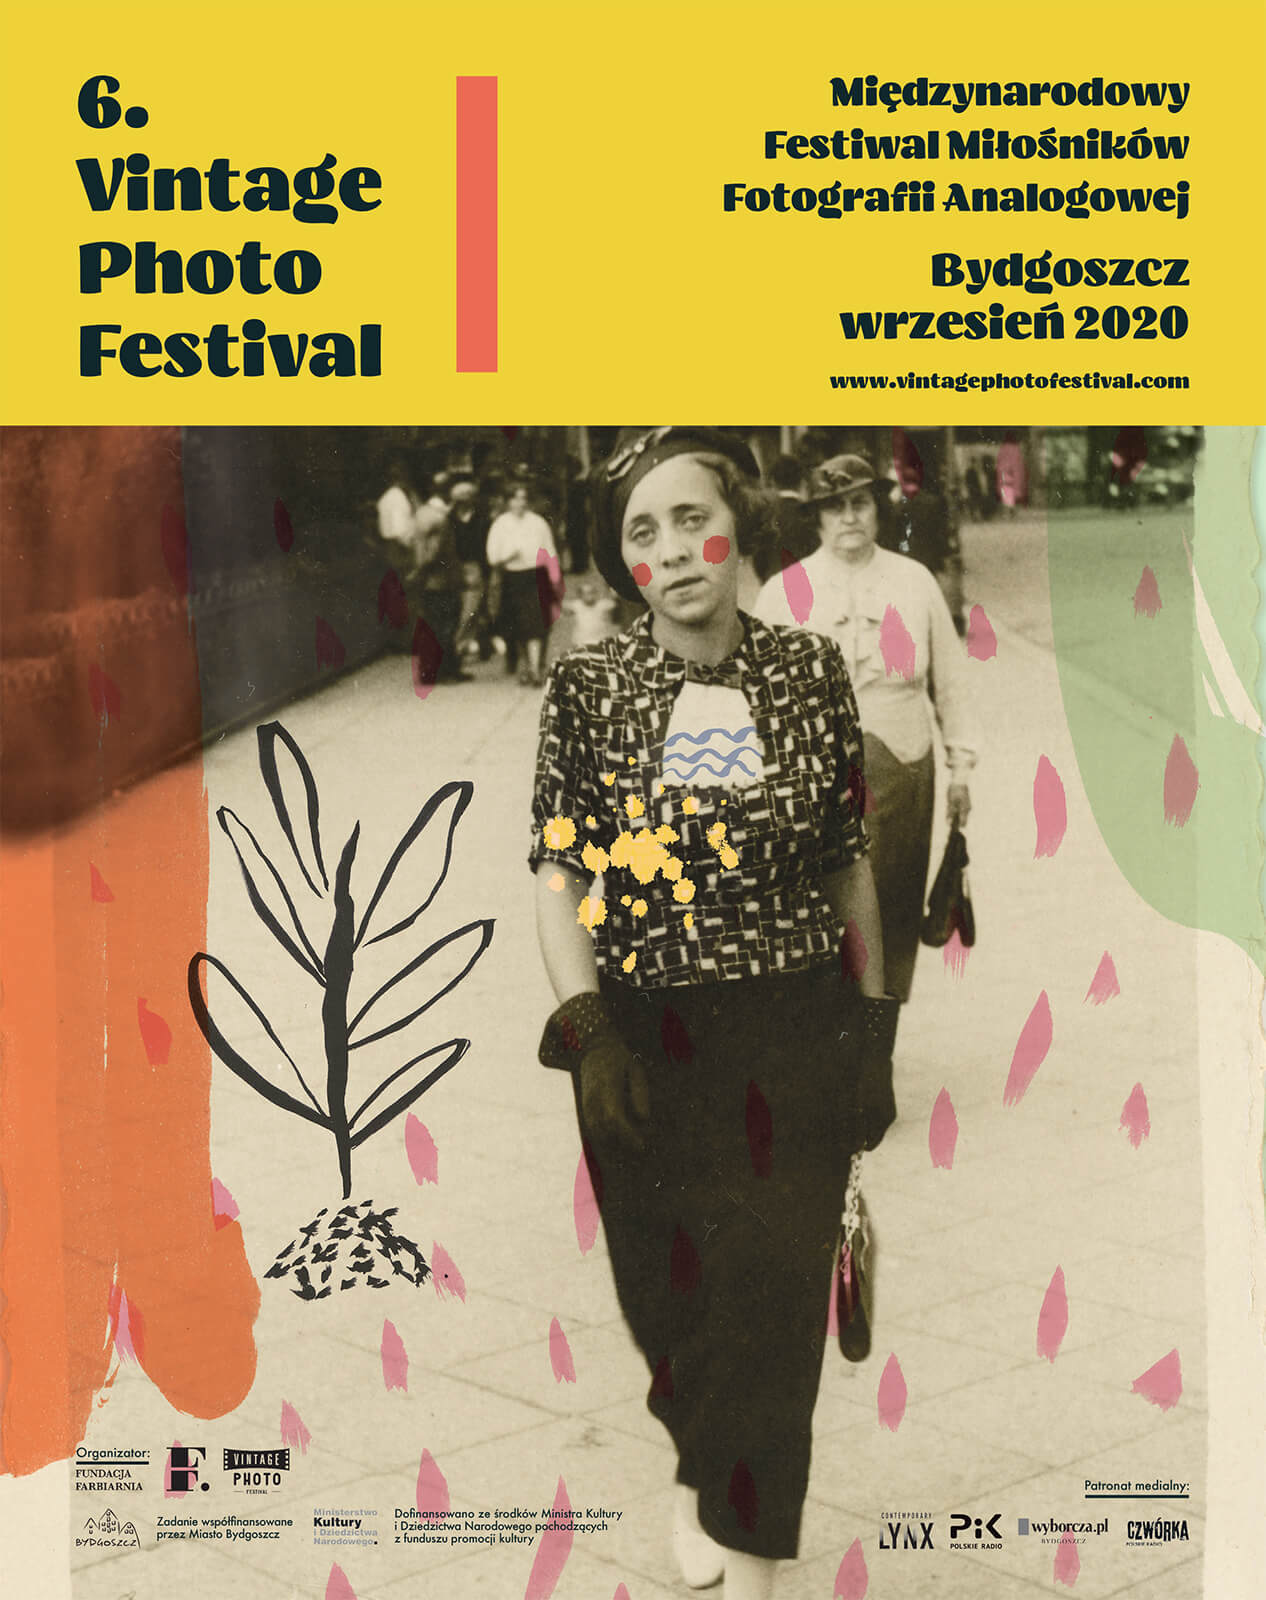 6. Vintage Photo Festival 2020